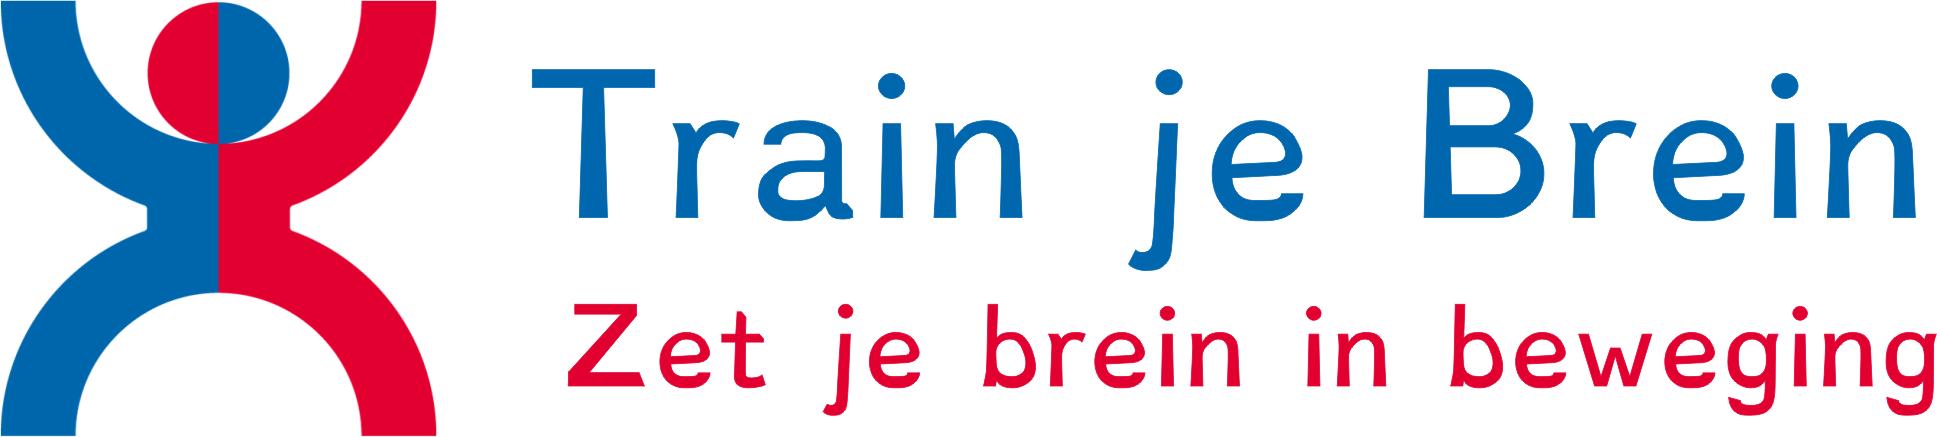 Trainjebrein logo2